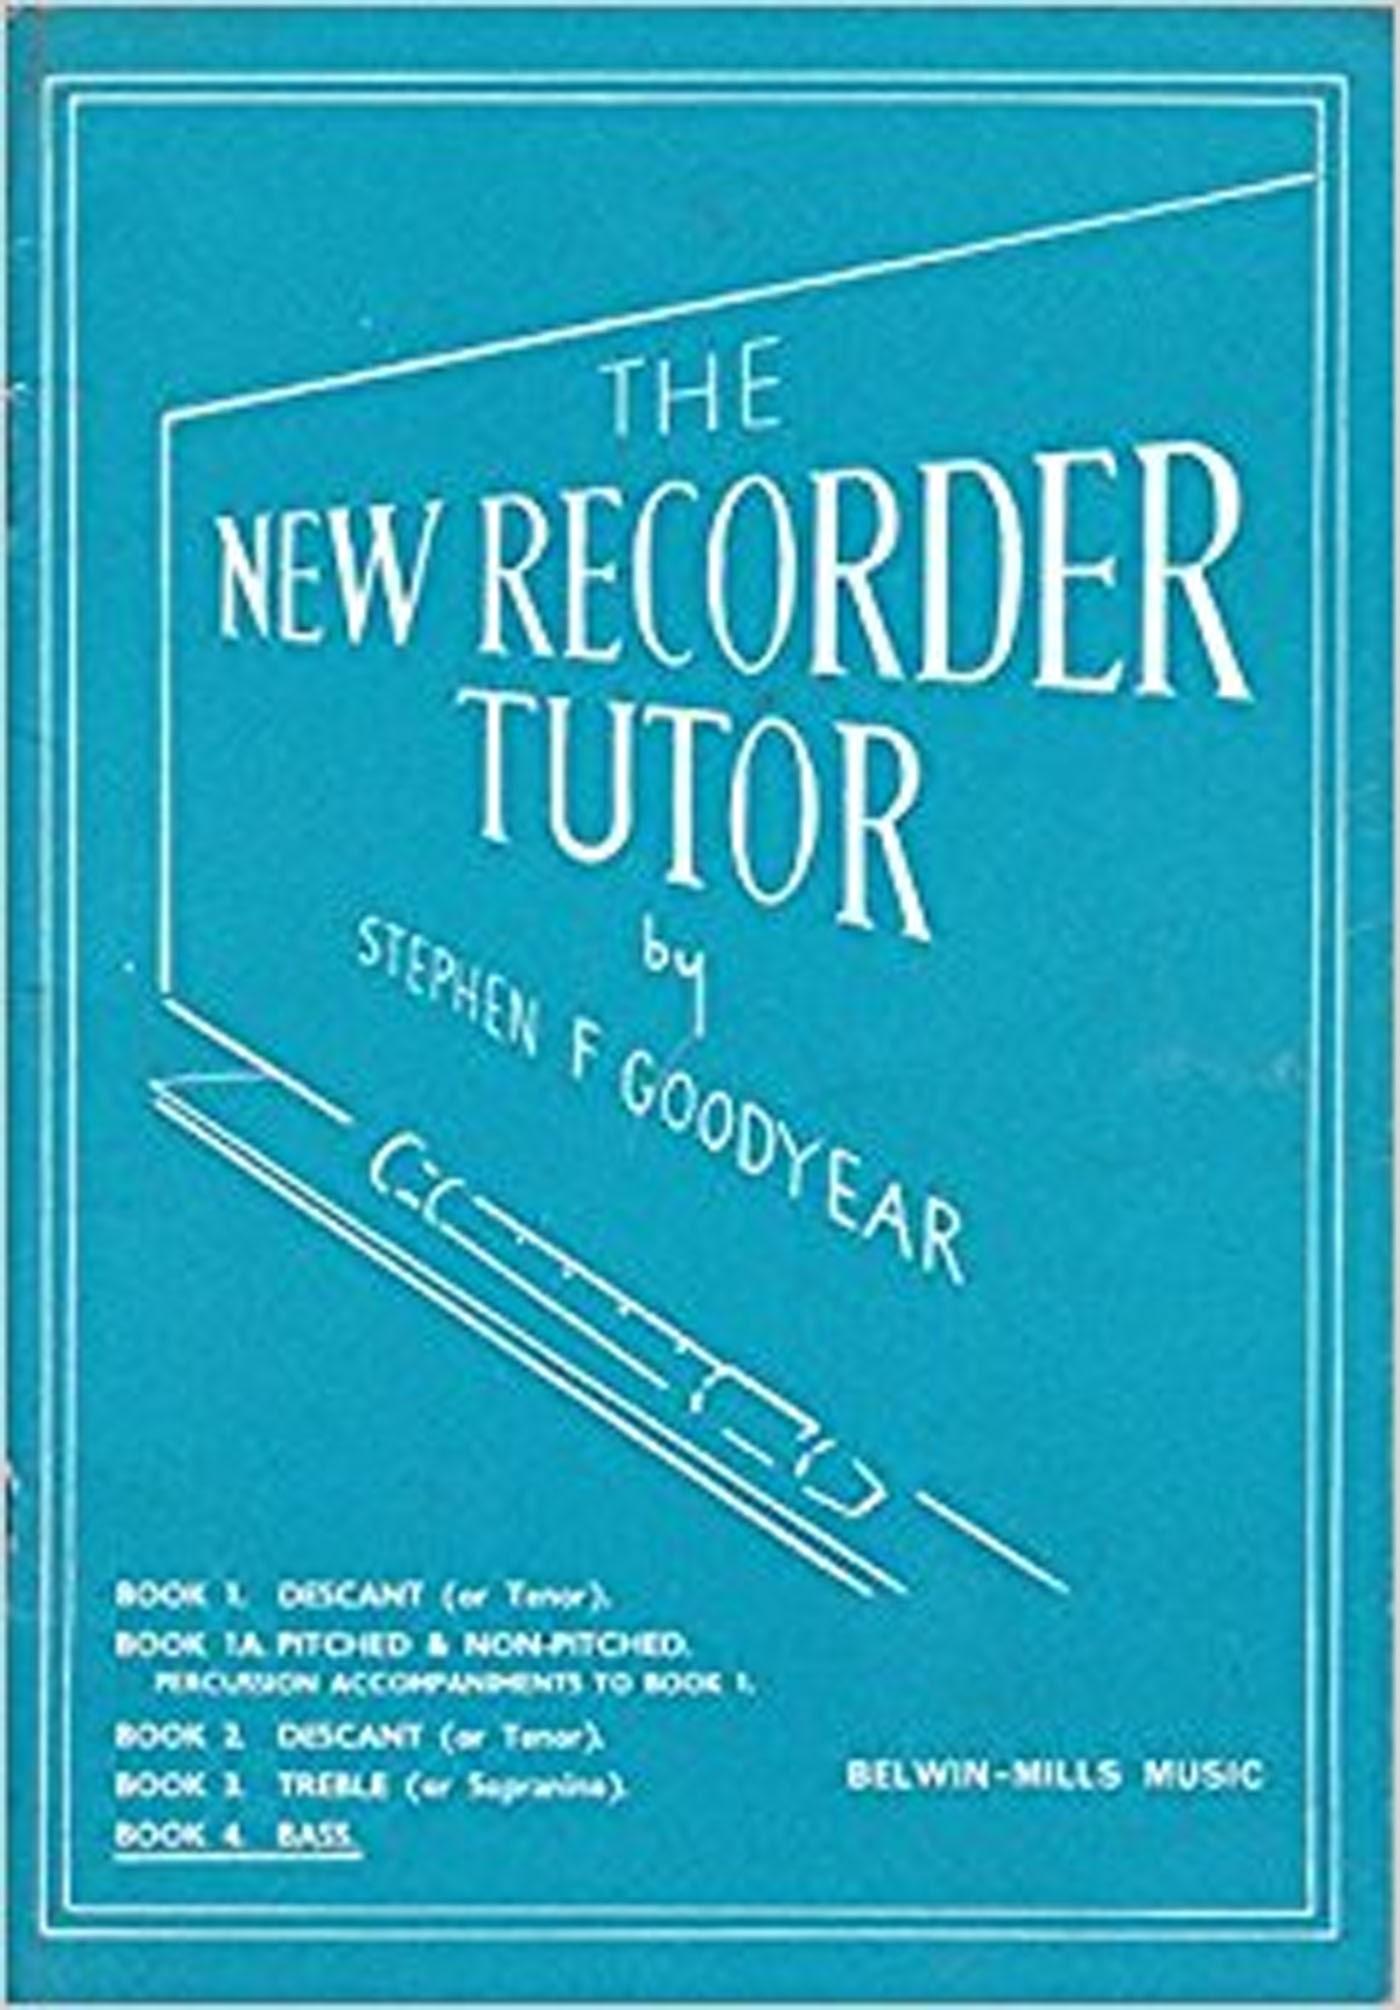 The New Recorder Tutor Book 4 Bass Stephen Goodyear S155